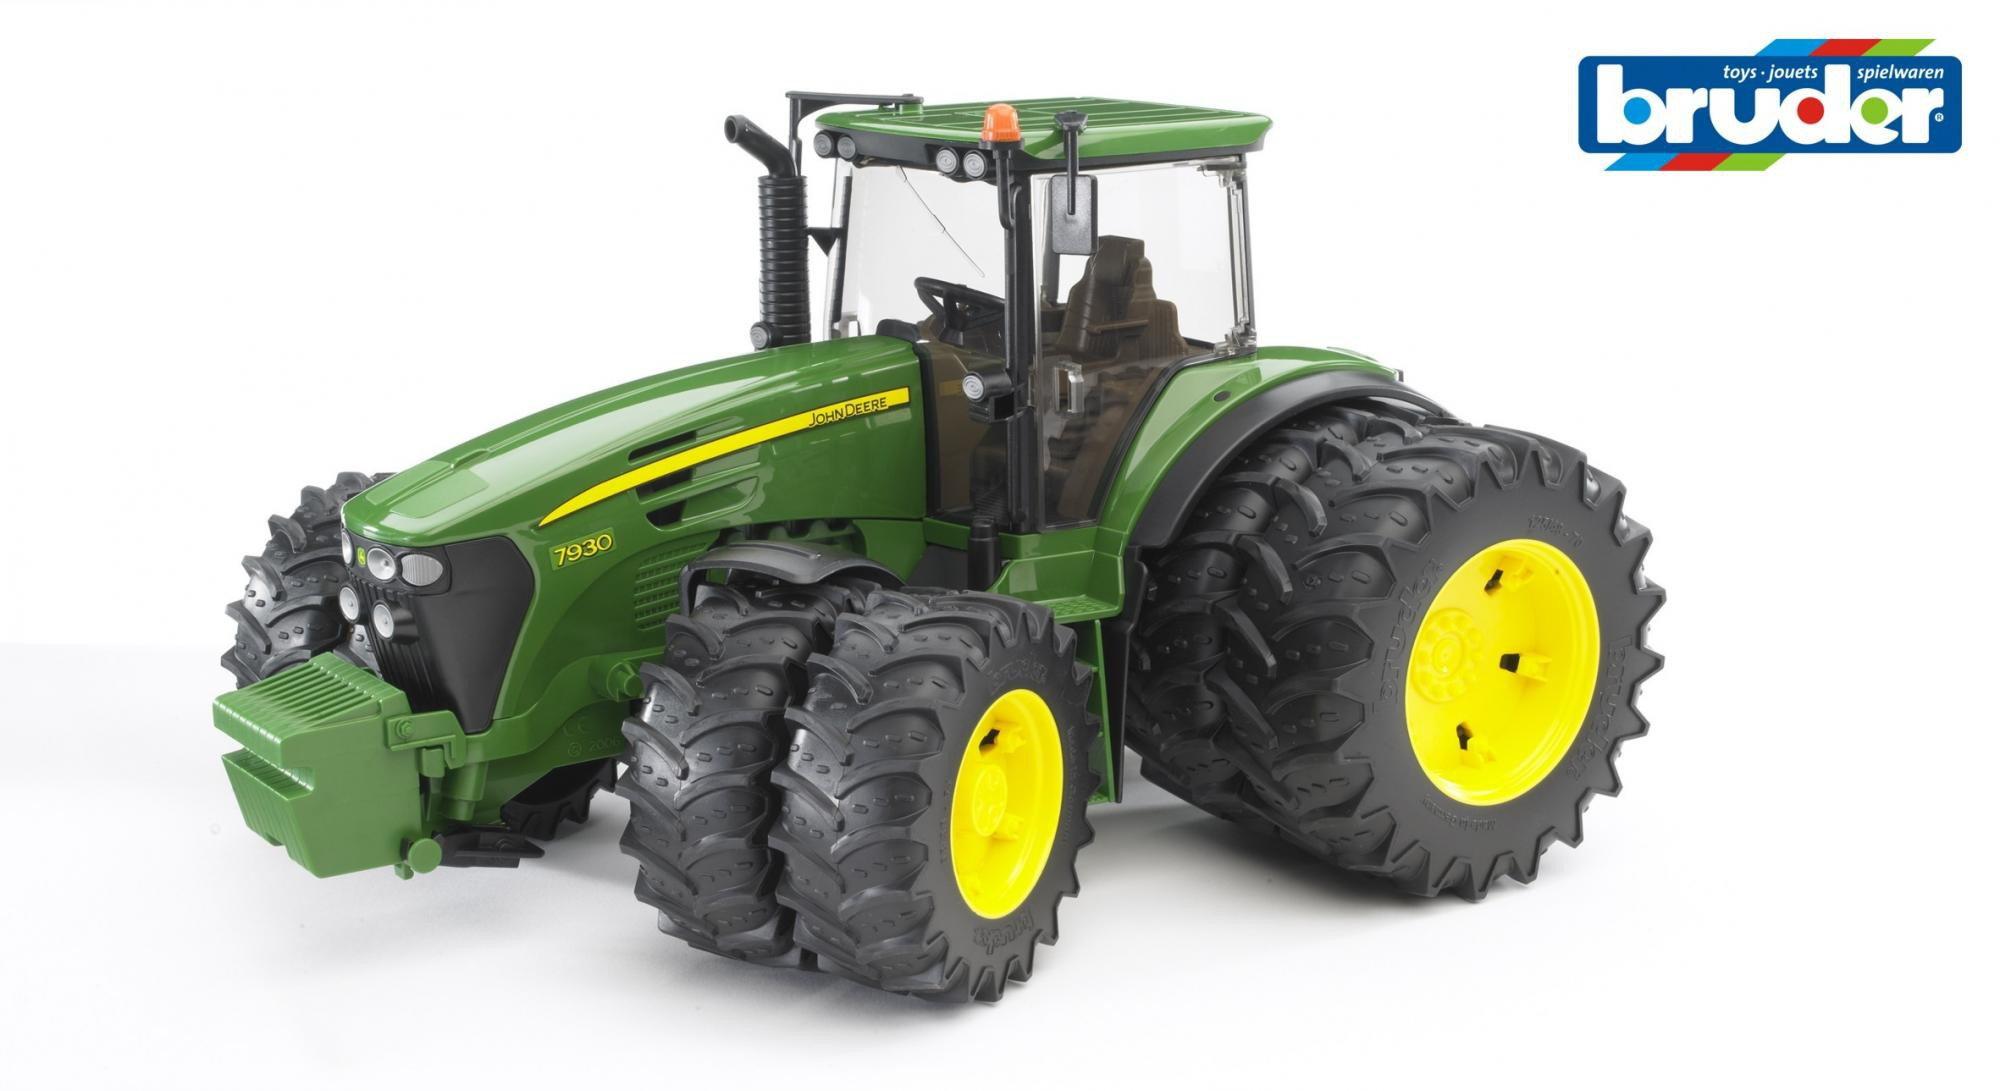 Bruder Traktor John Deere 9730, podwójne koła